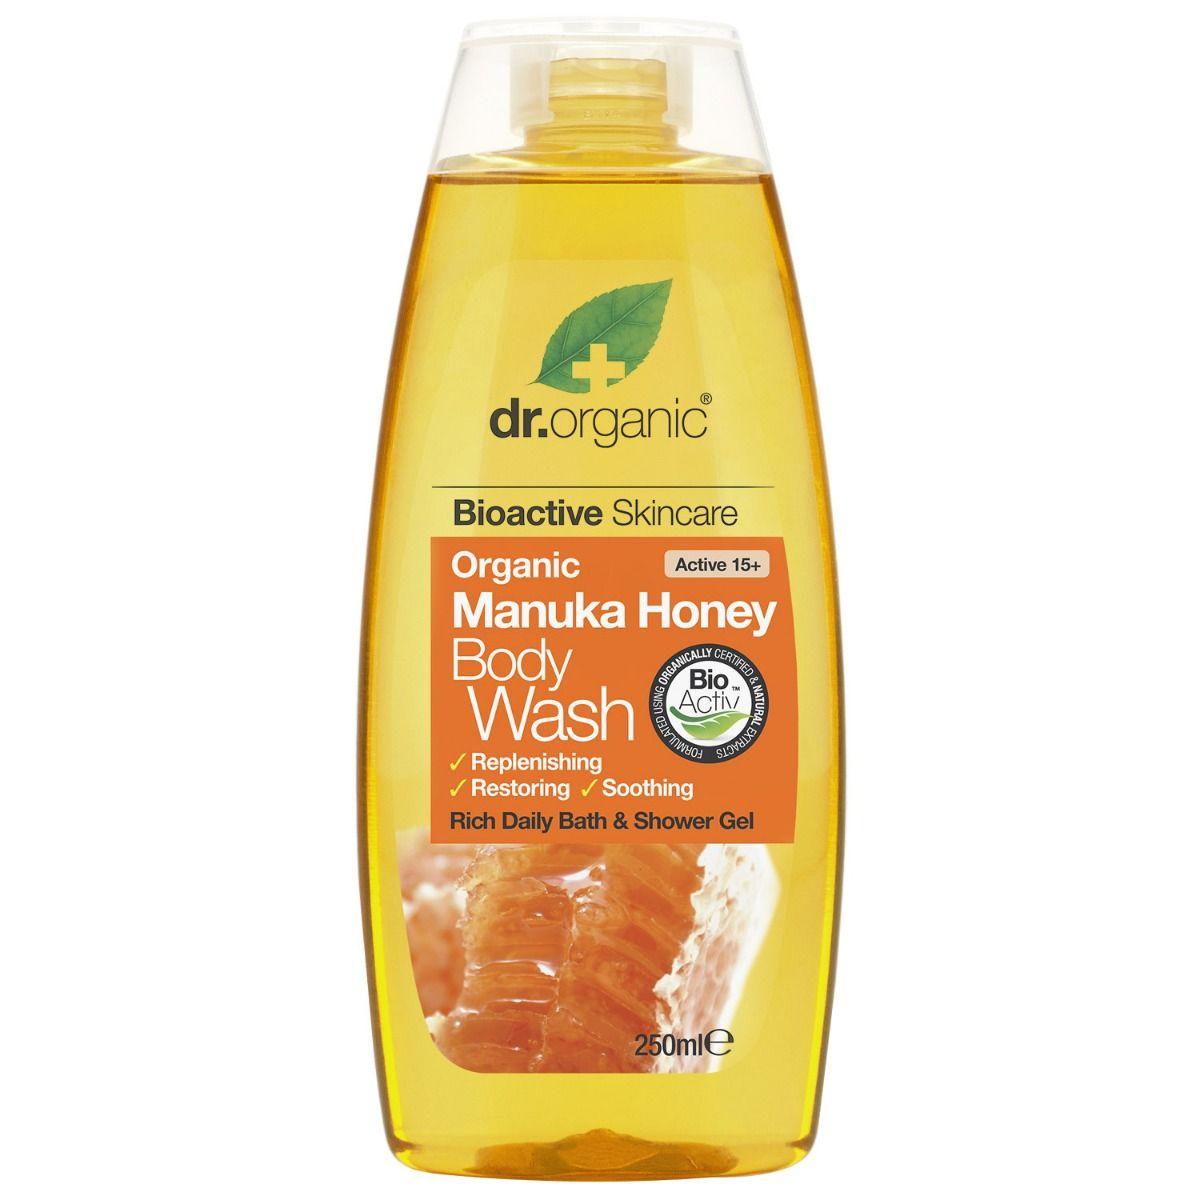 Dr.Organic Manuka Honey Body Wash, 250 ml